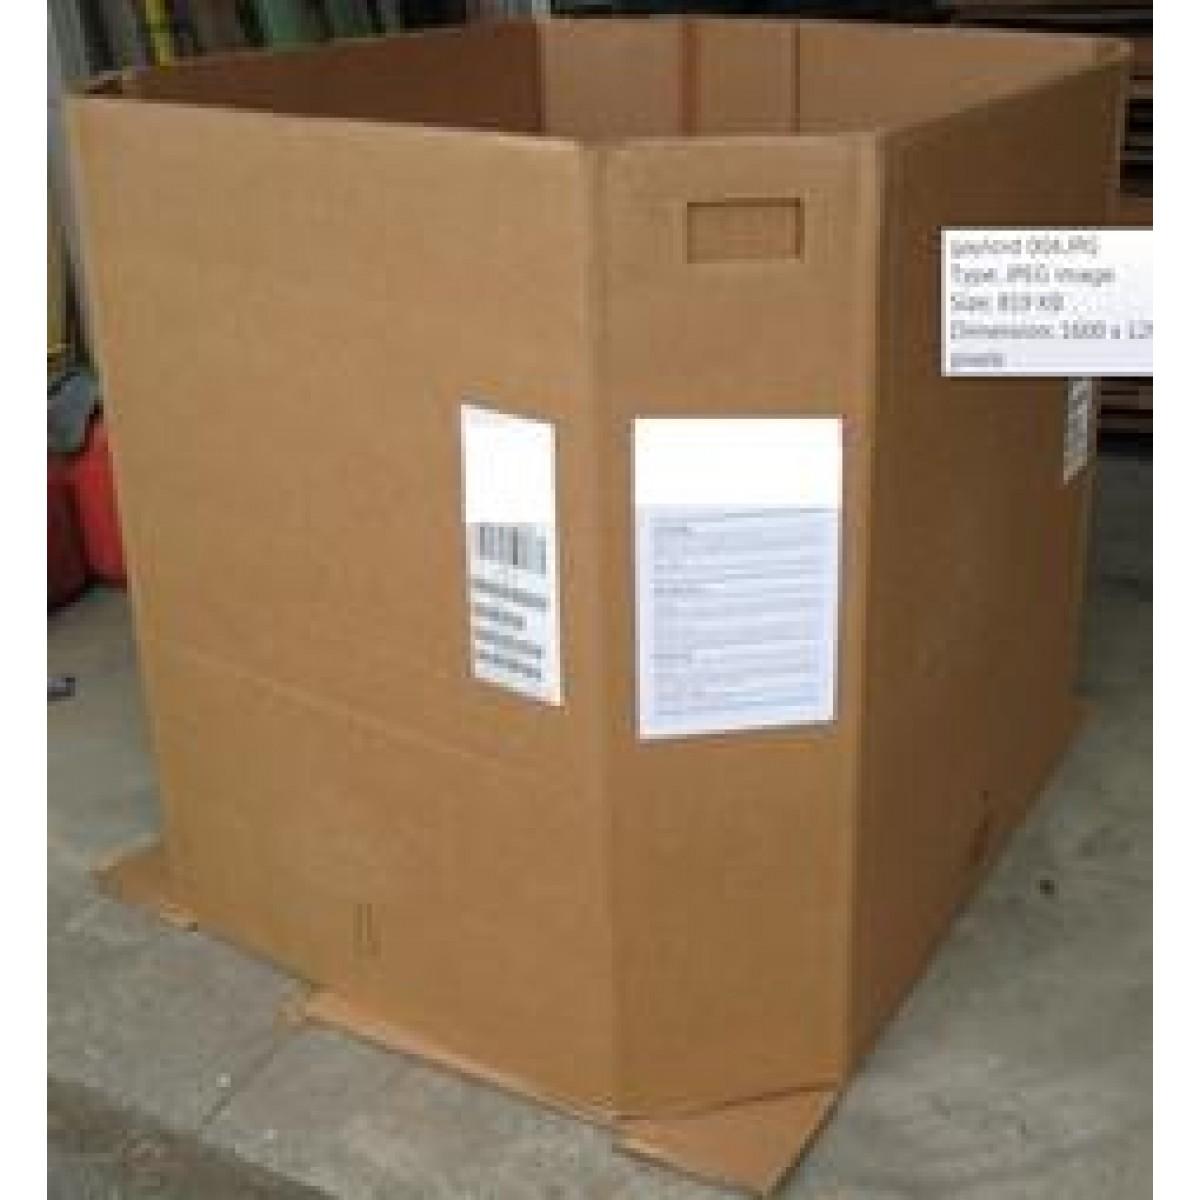 Gaylord Boxes Hpt41 Totes